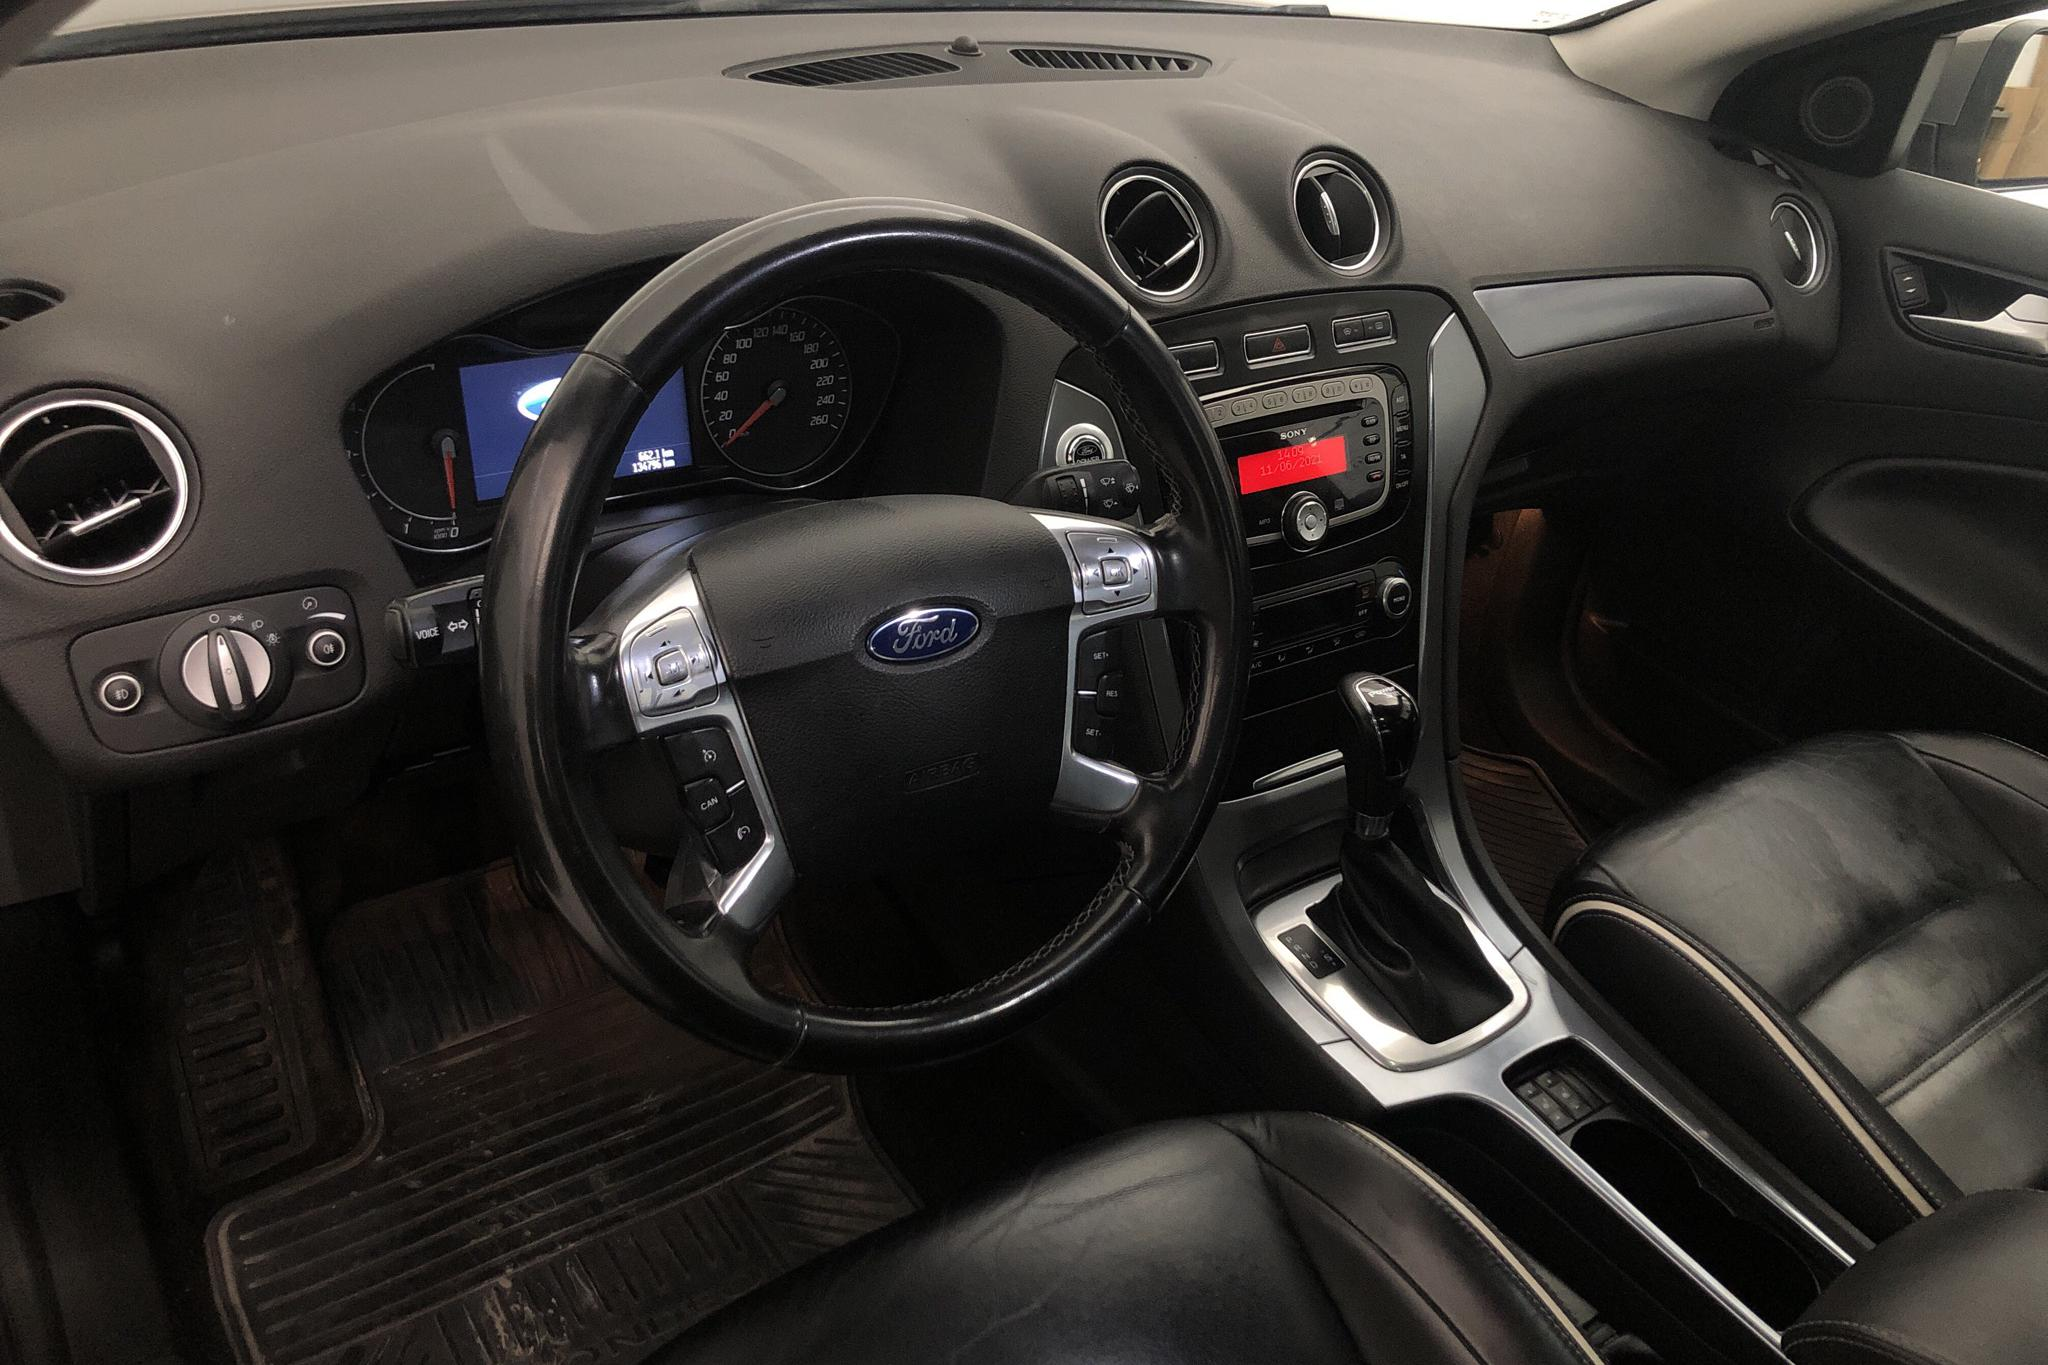 Ford Mondeo 2.0 Duratorq TDCi 5dr (140hk) - 13 479 mil - Automat - brun - 2011